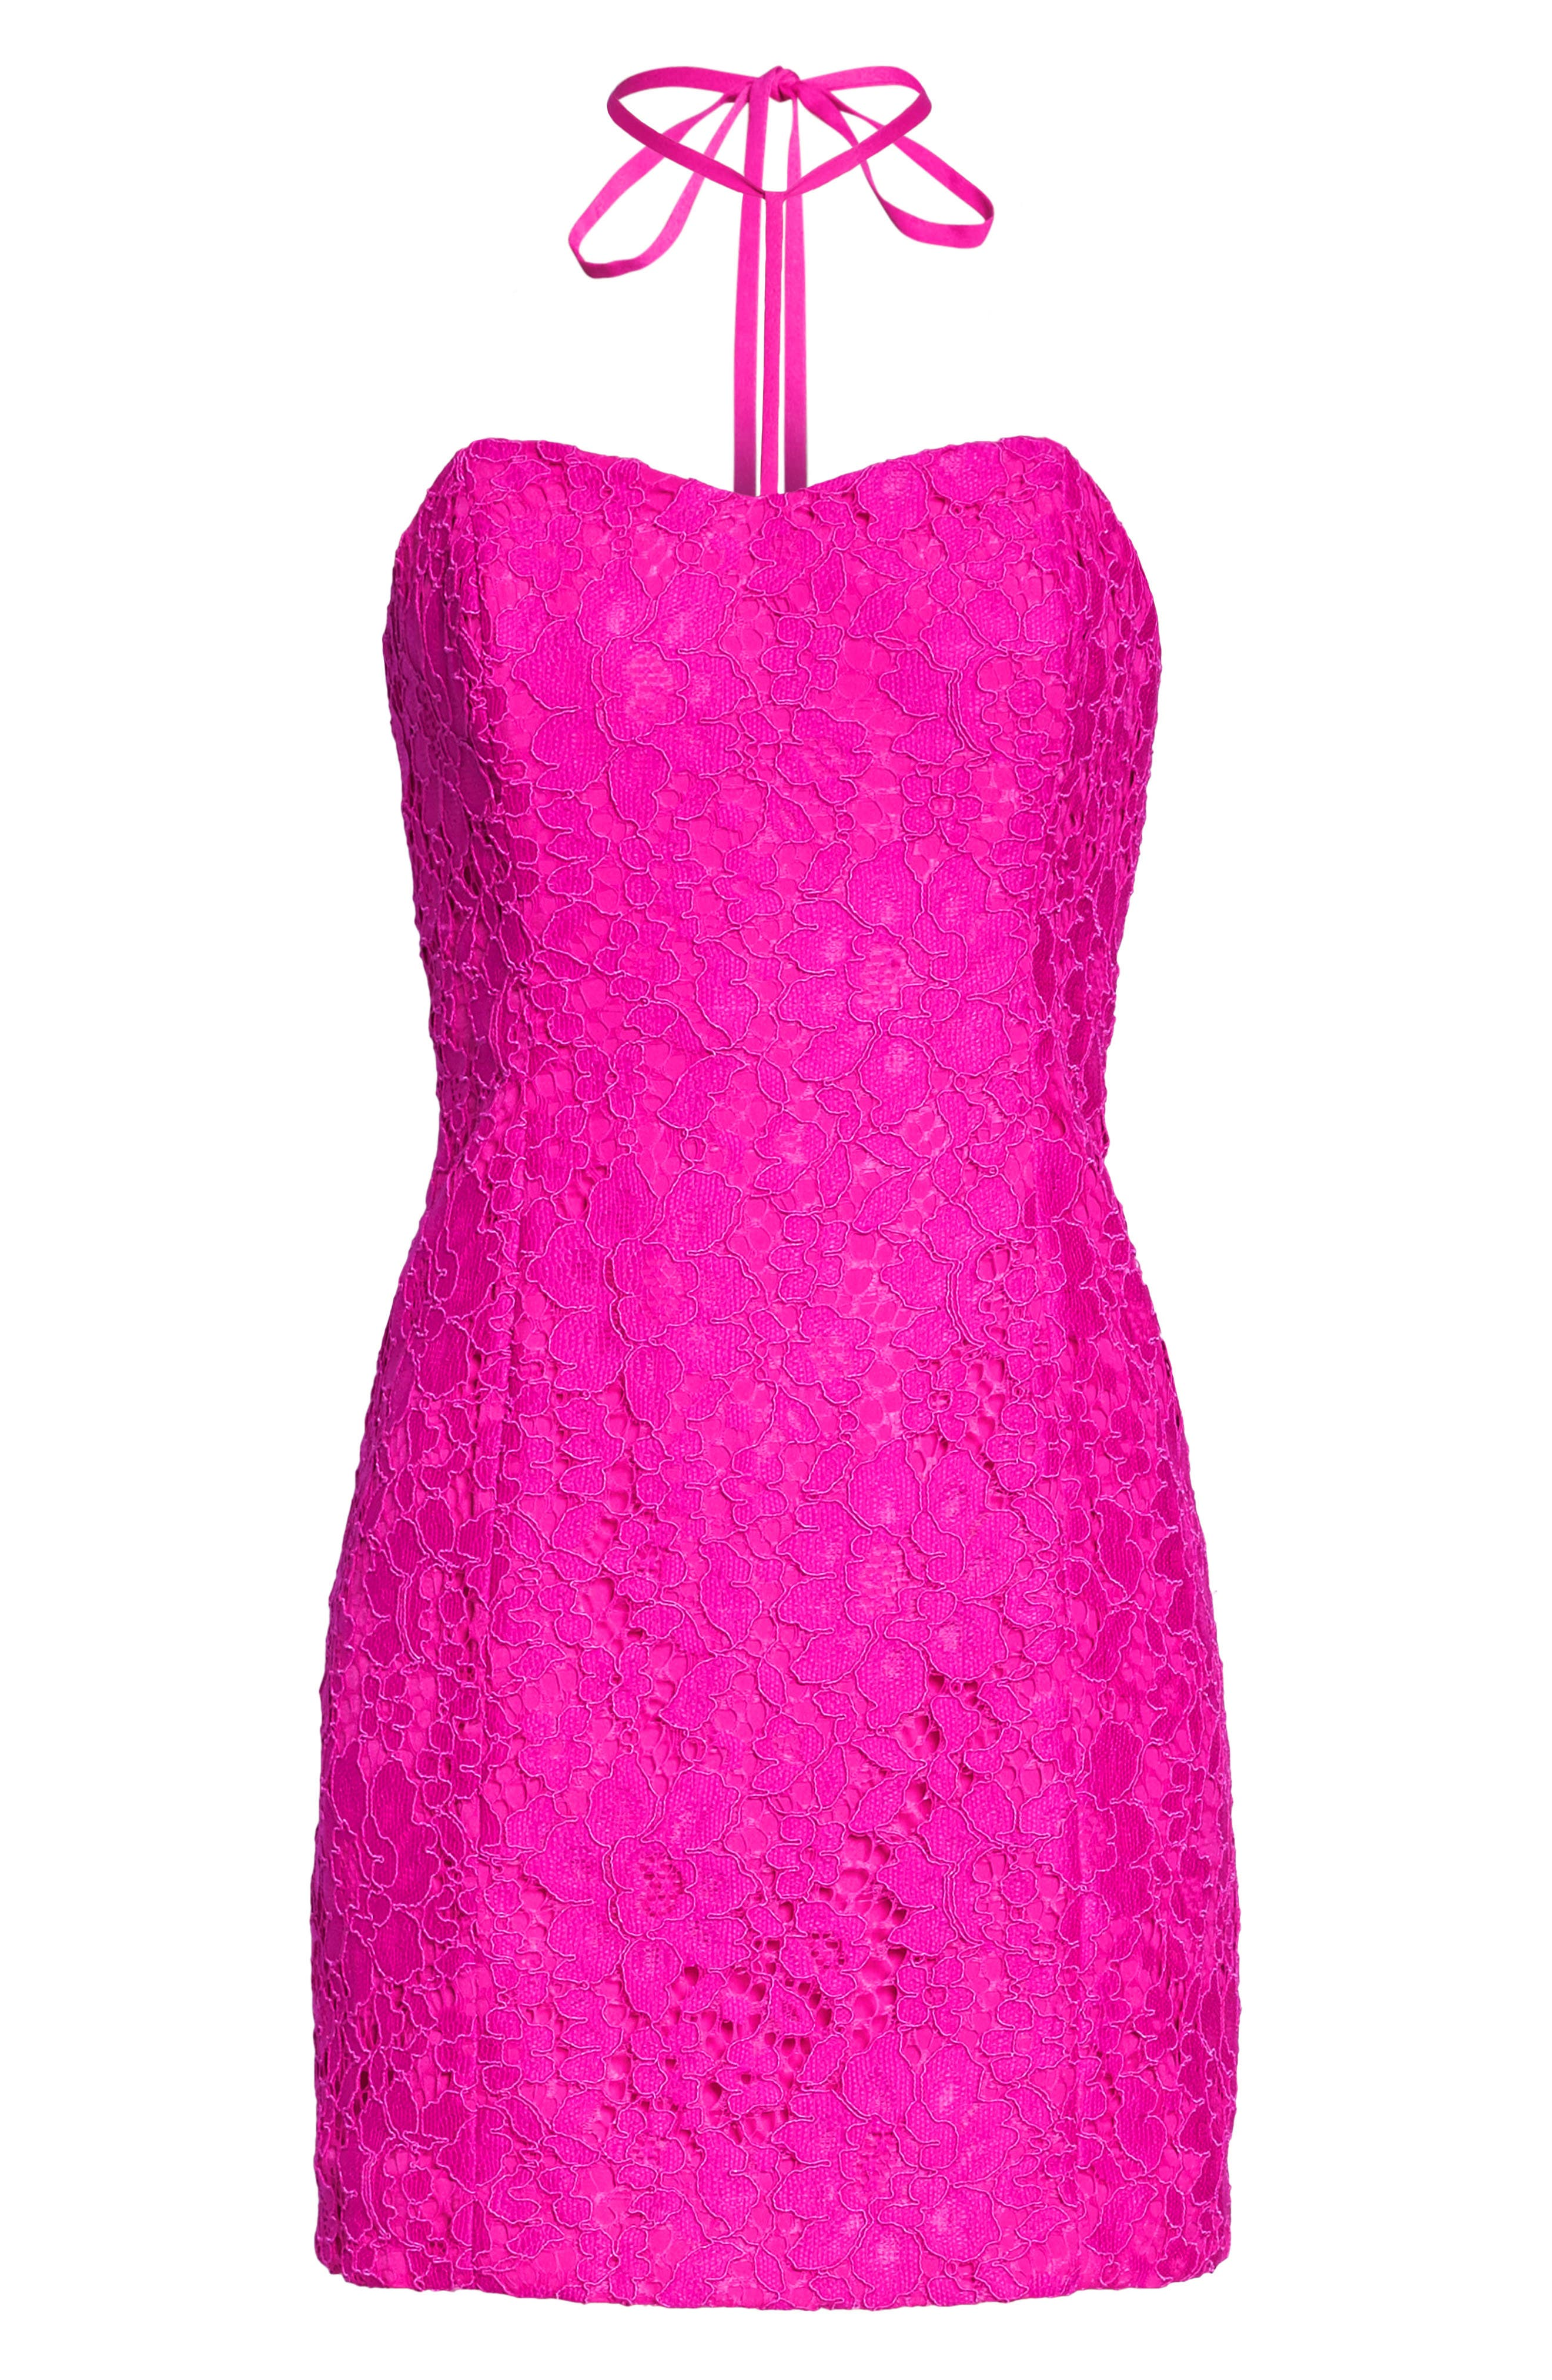 Demi Lace Dress,                             Alternate thumbnail 9, color,                             650